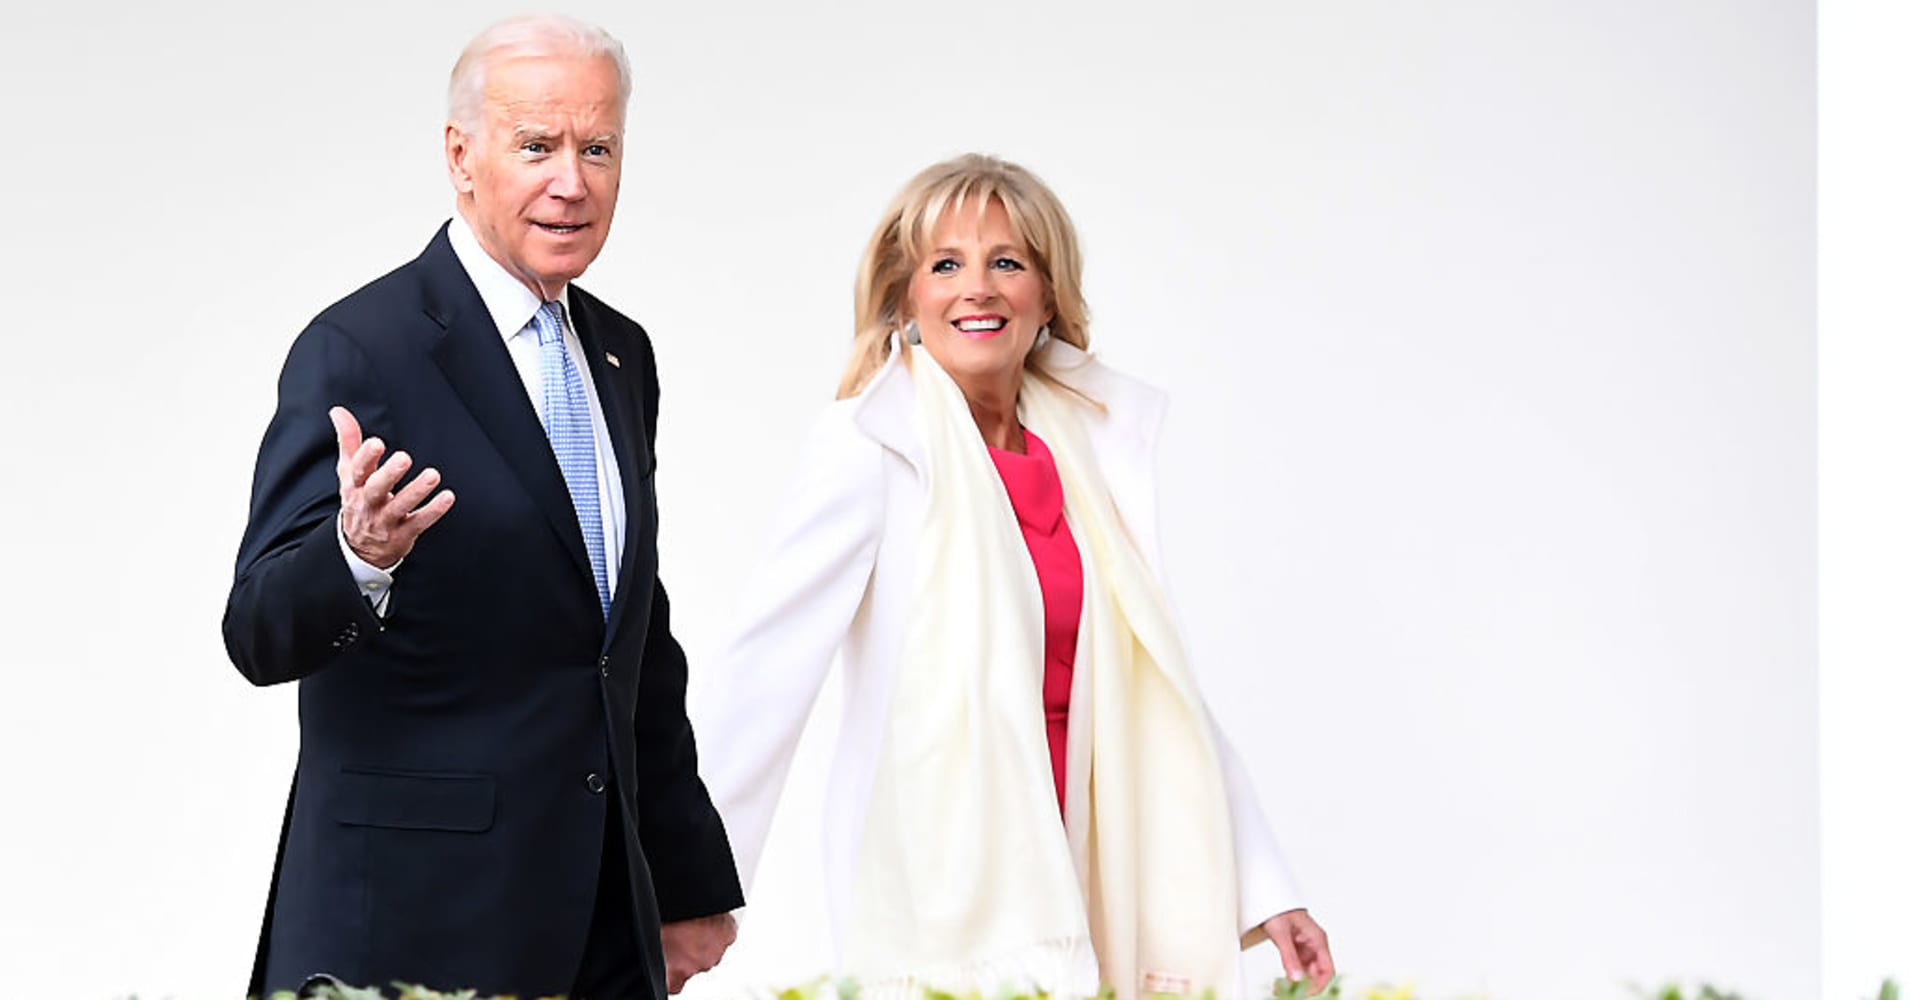 Biden Foundation suspends operations, effective immediately